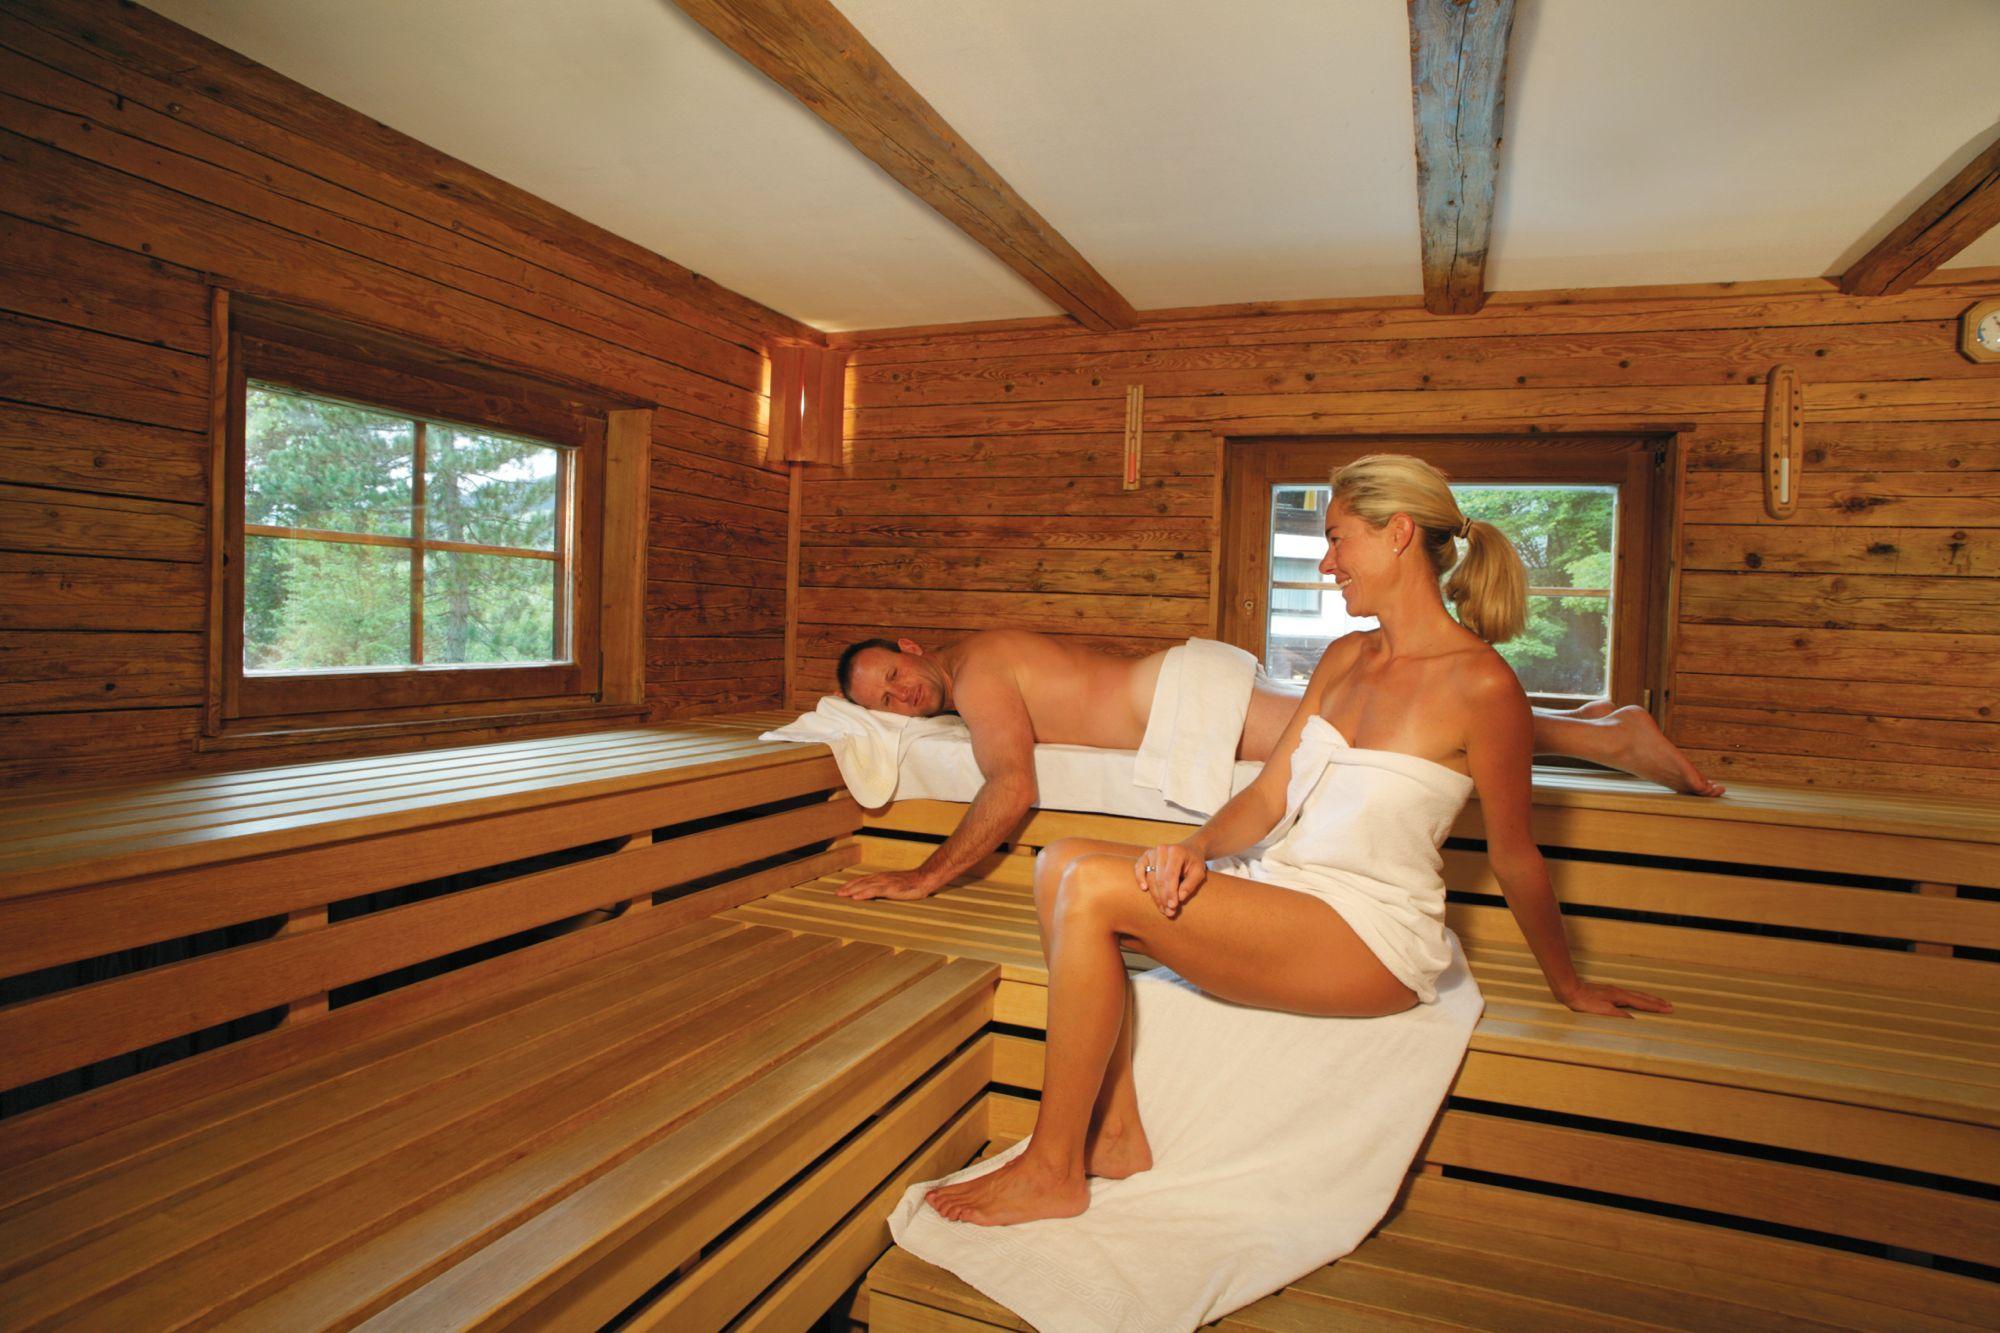 Sauna Men - Images of Males Enjoying the Heat